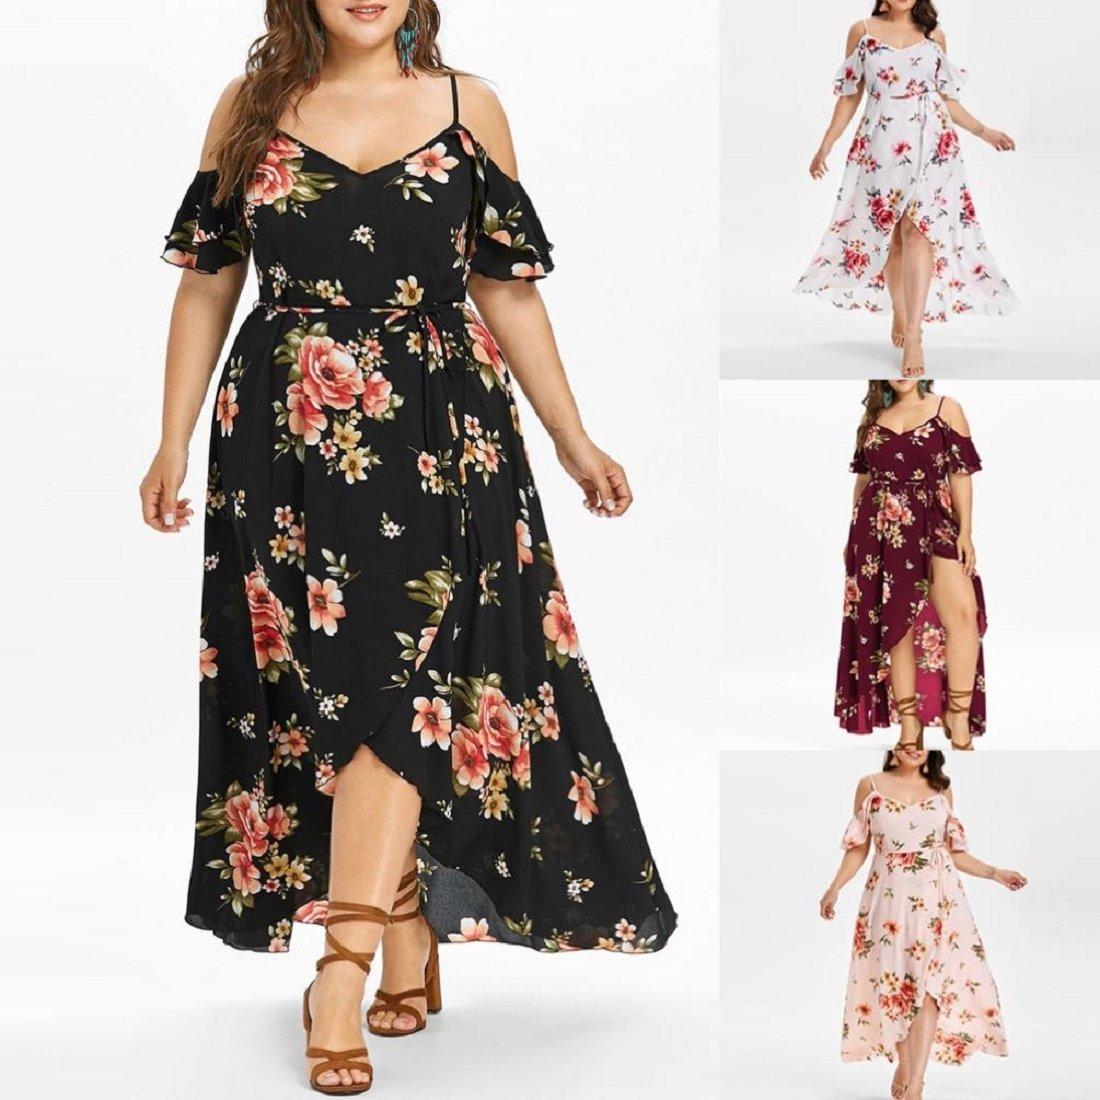 c50636aae79 GONKOMA Dresses Women s Plus Size Dress Short Sleeve Cold Shoulder Boho  Flower Print Long Dress at Amazon Women s Clothing store